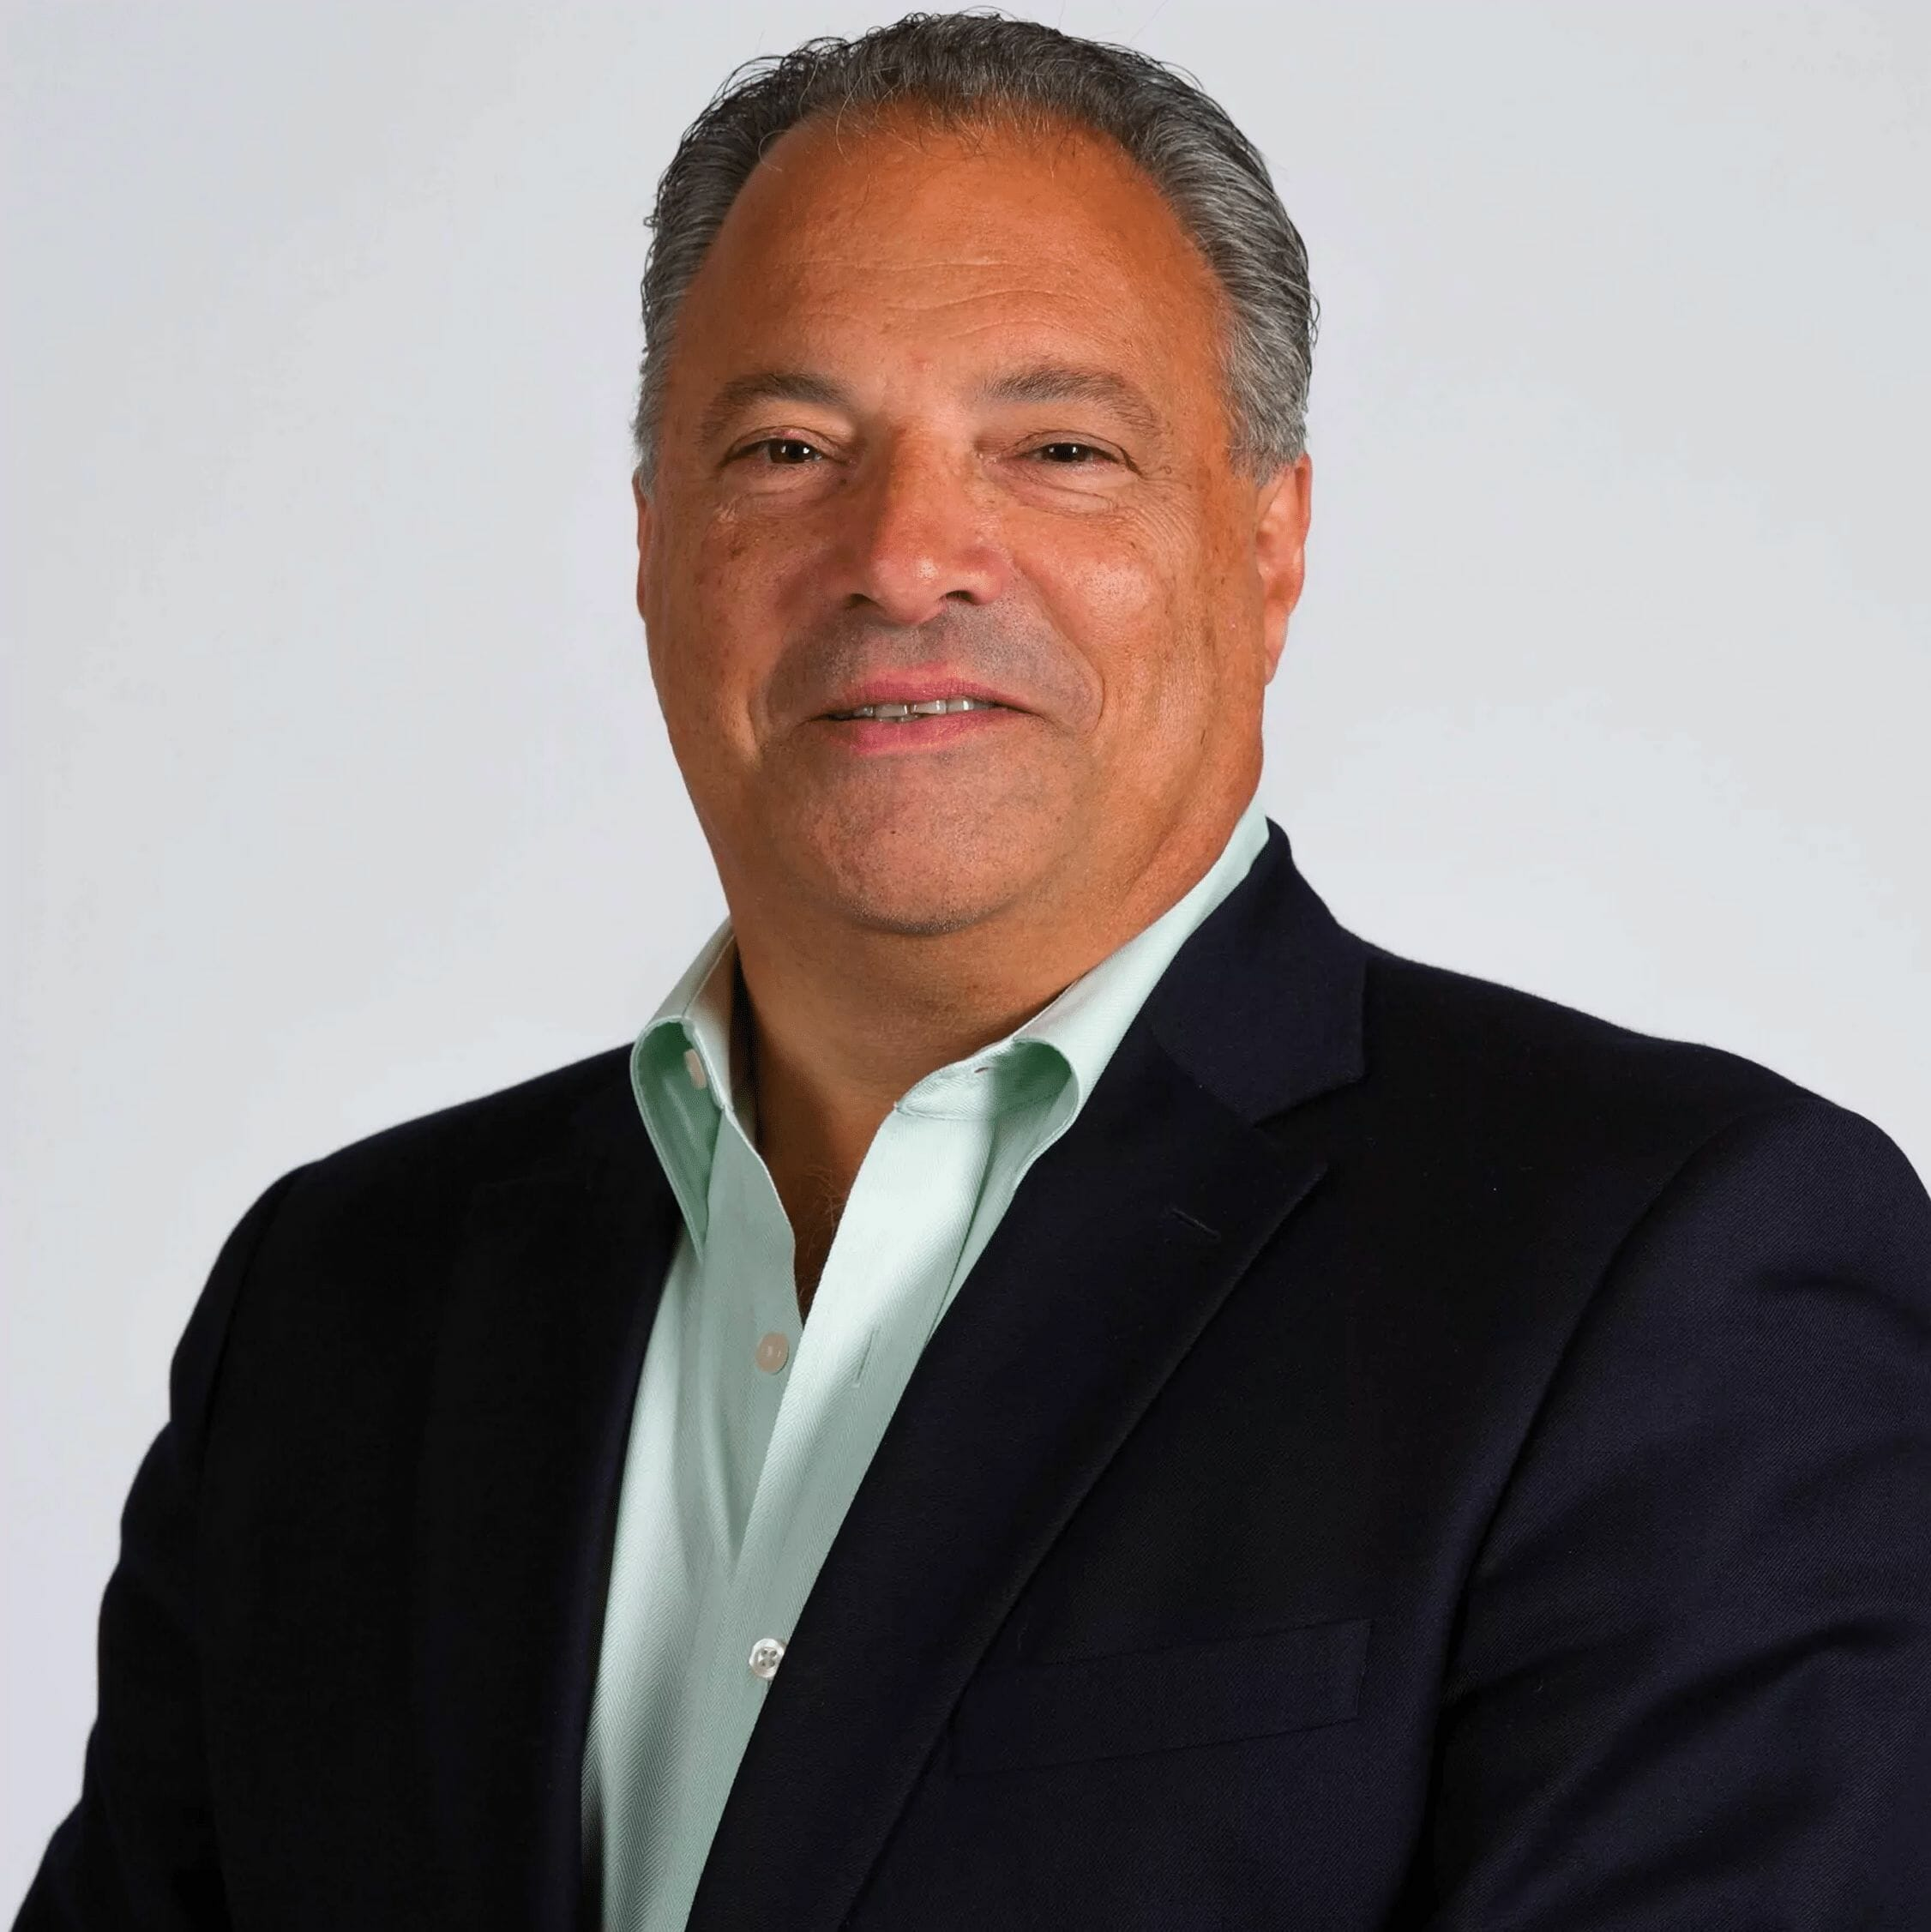 Peter Verlezza | Managing Partner of SMB Networks, LLC